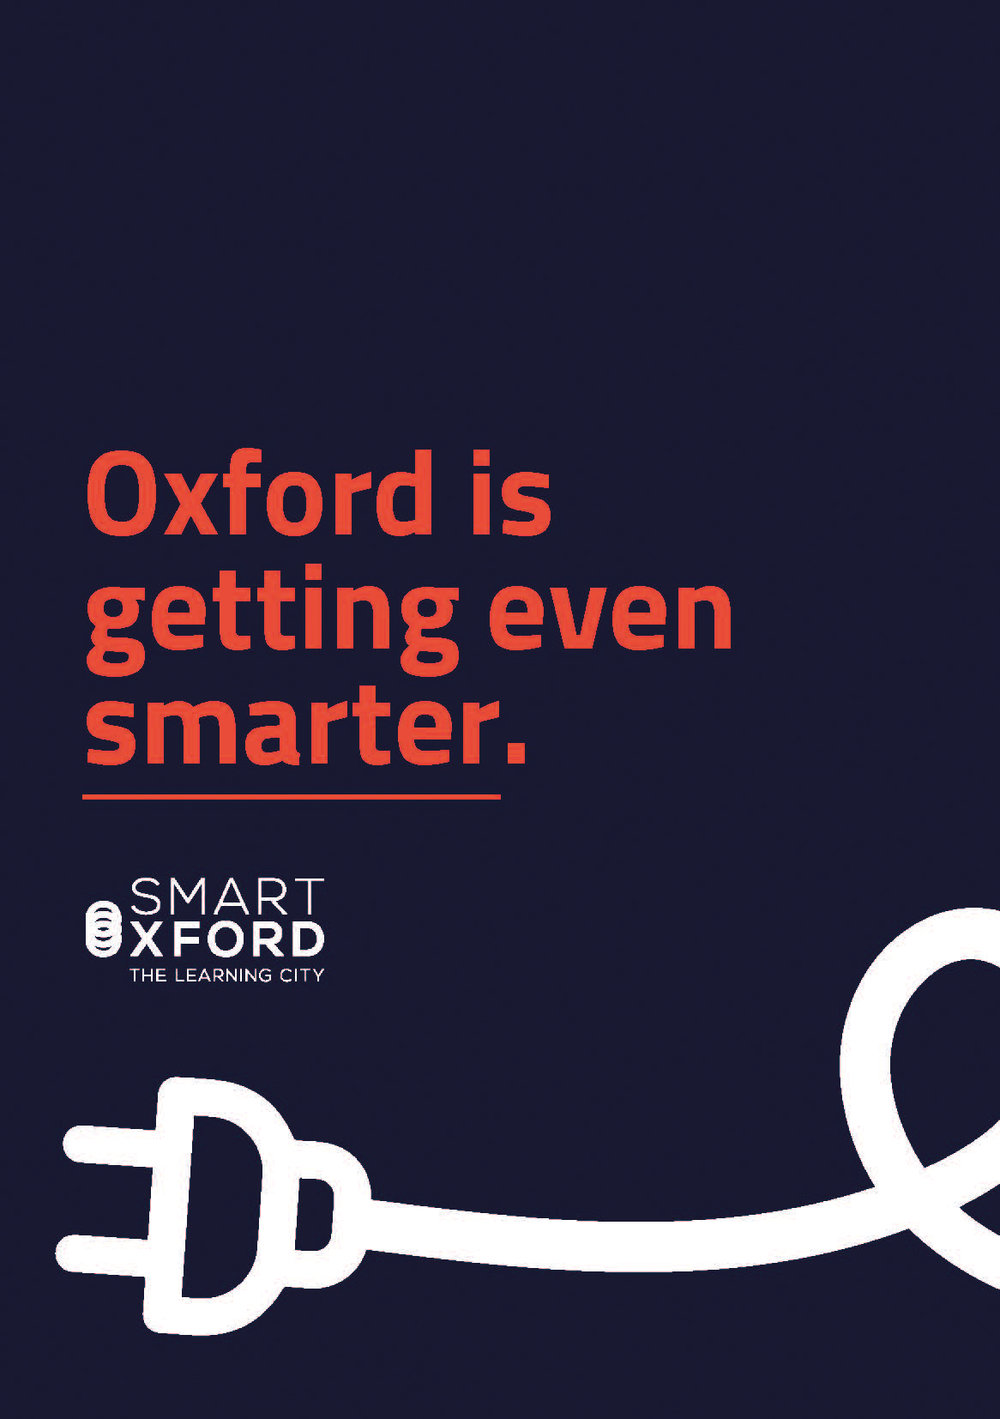 Smart Oxford LW v002_Page_1.jpg